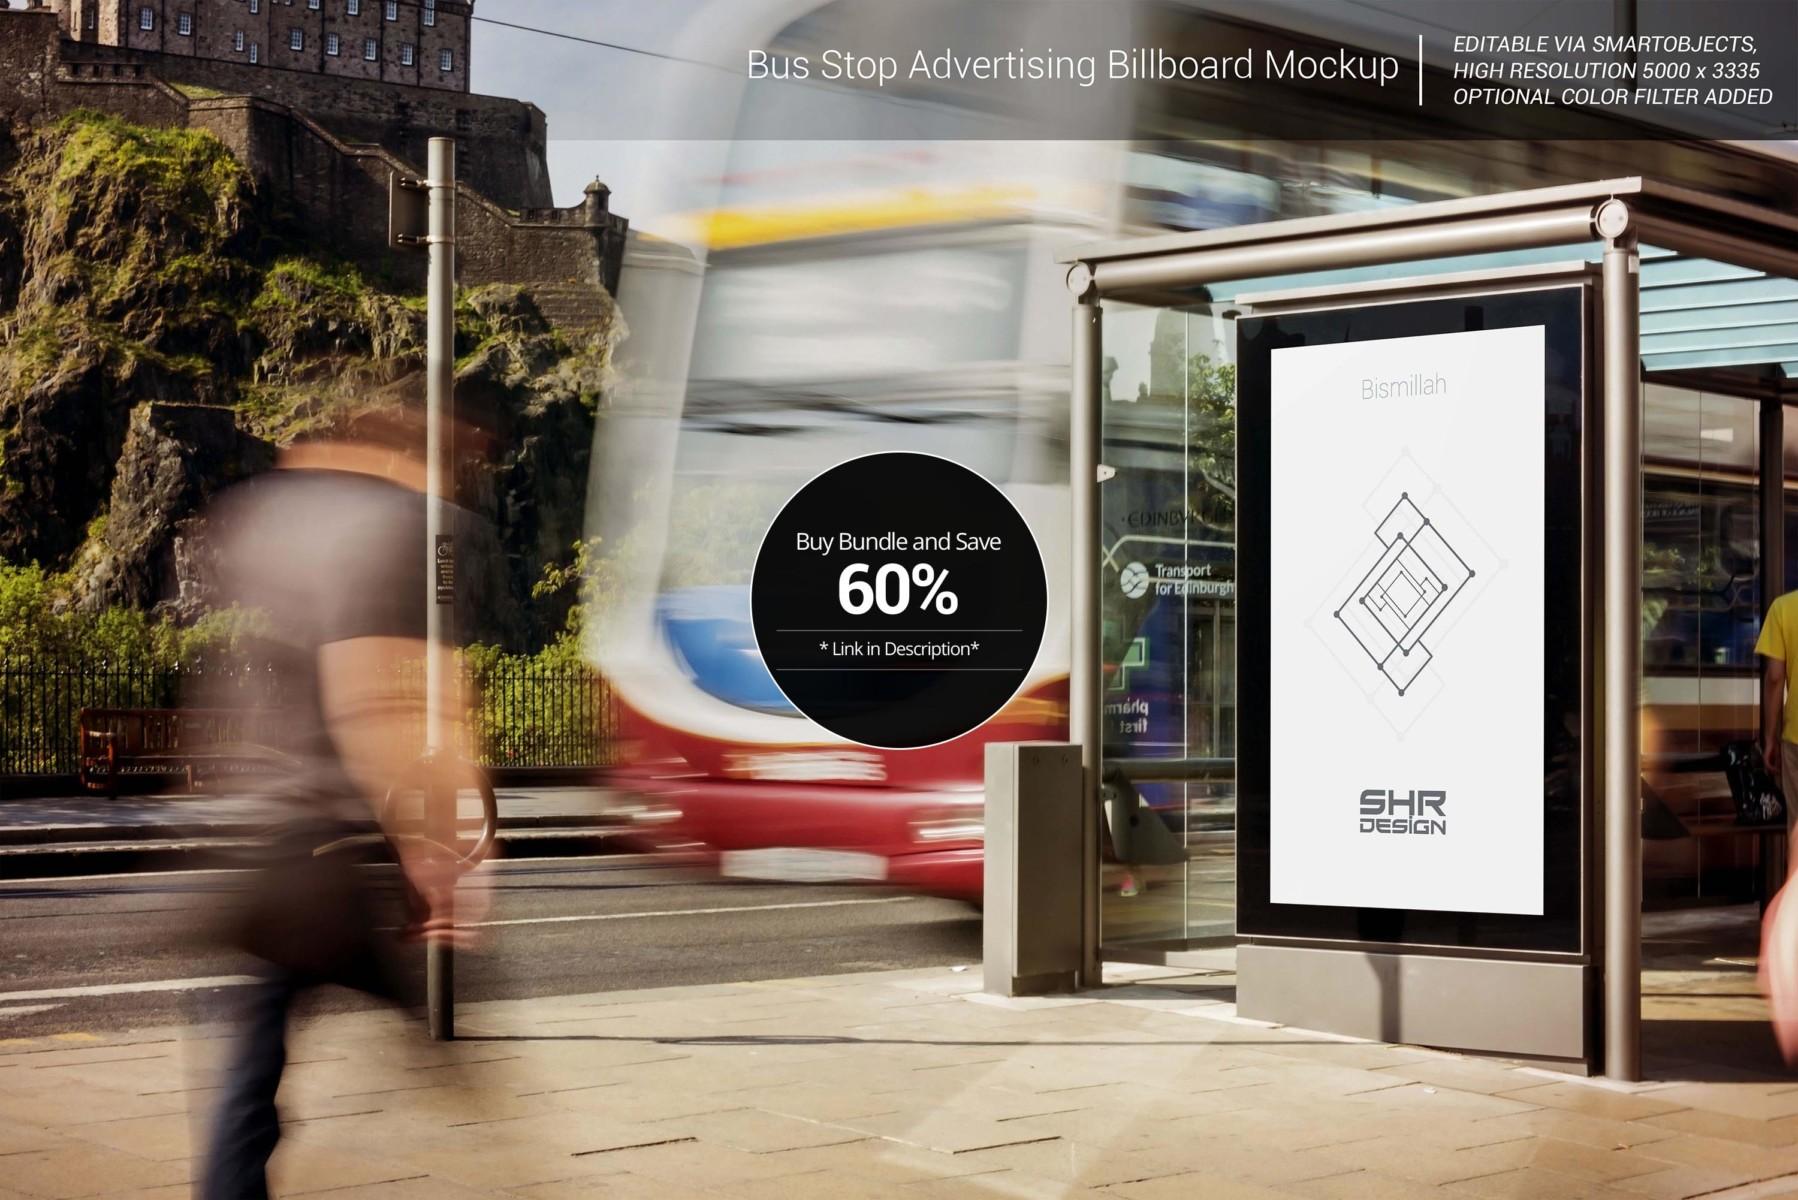 outdoor-signage-billboard-mockup_mockup-design-free-mockups-mockup-templates